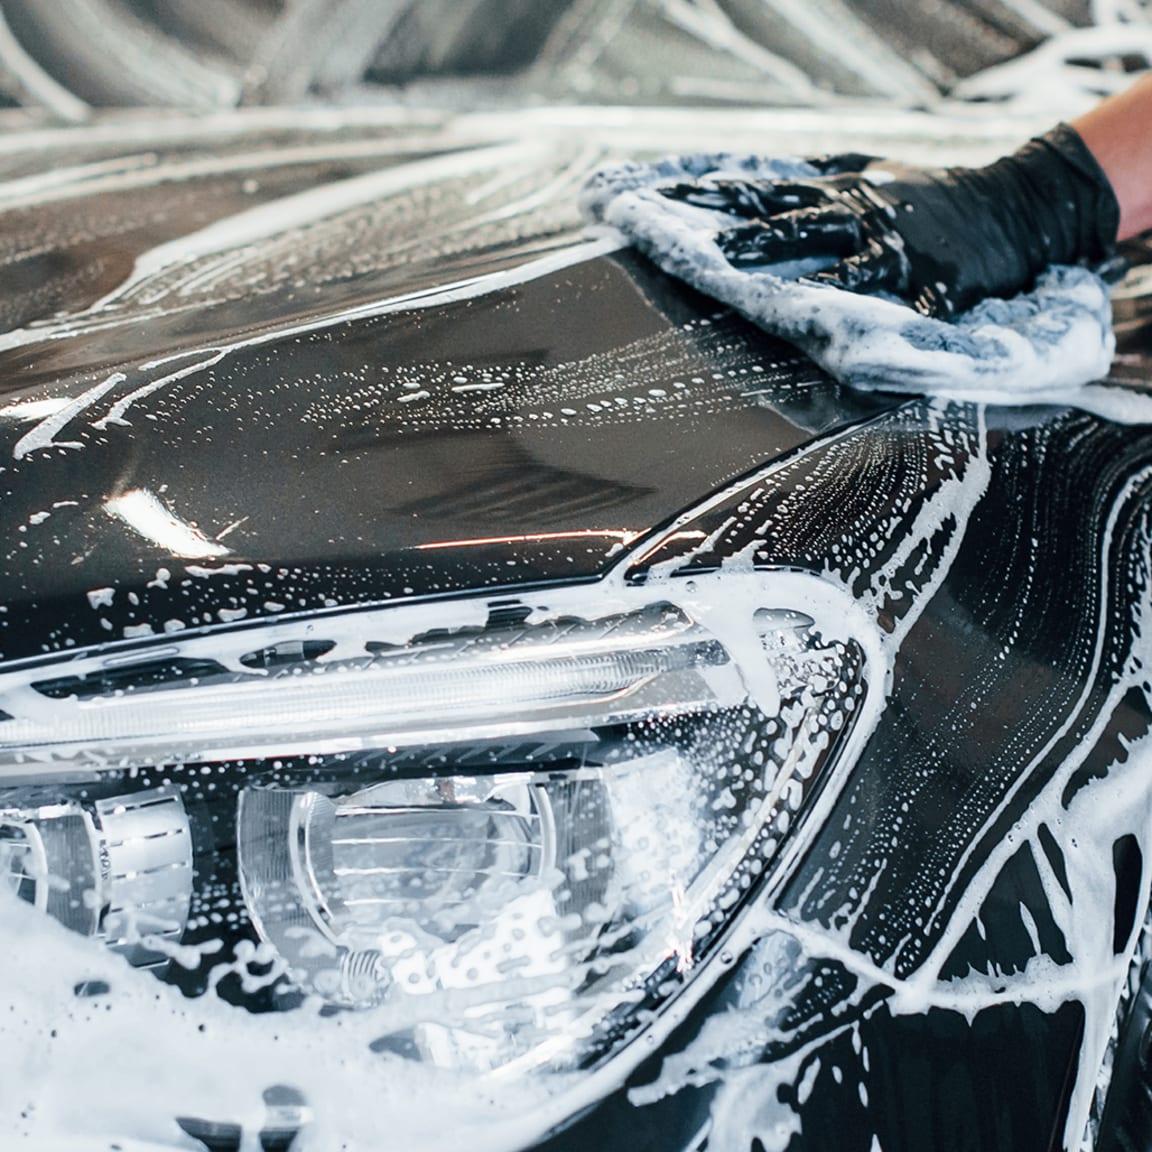 Concierge Car Wash: Refer a friend and receive a $10 Visa Card